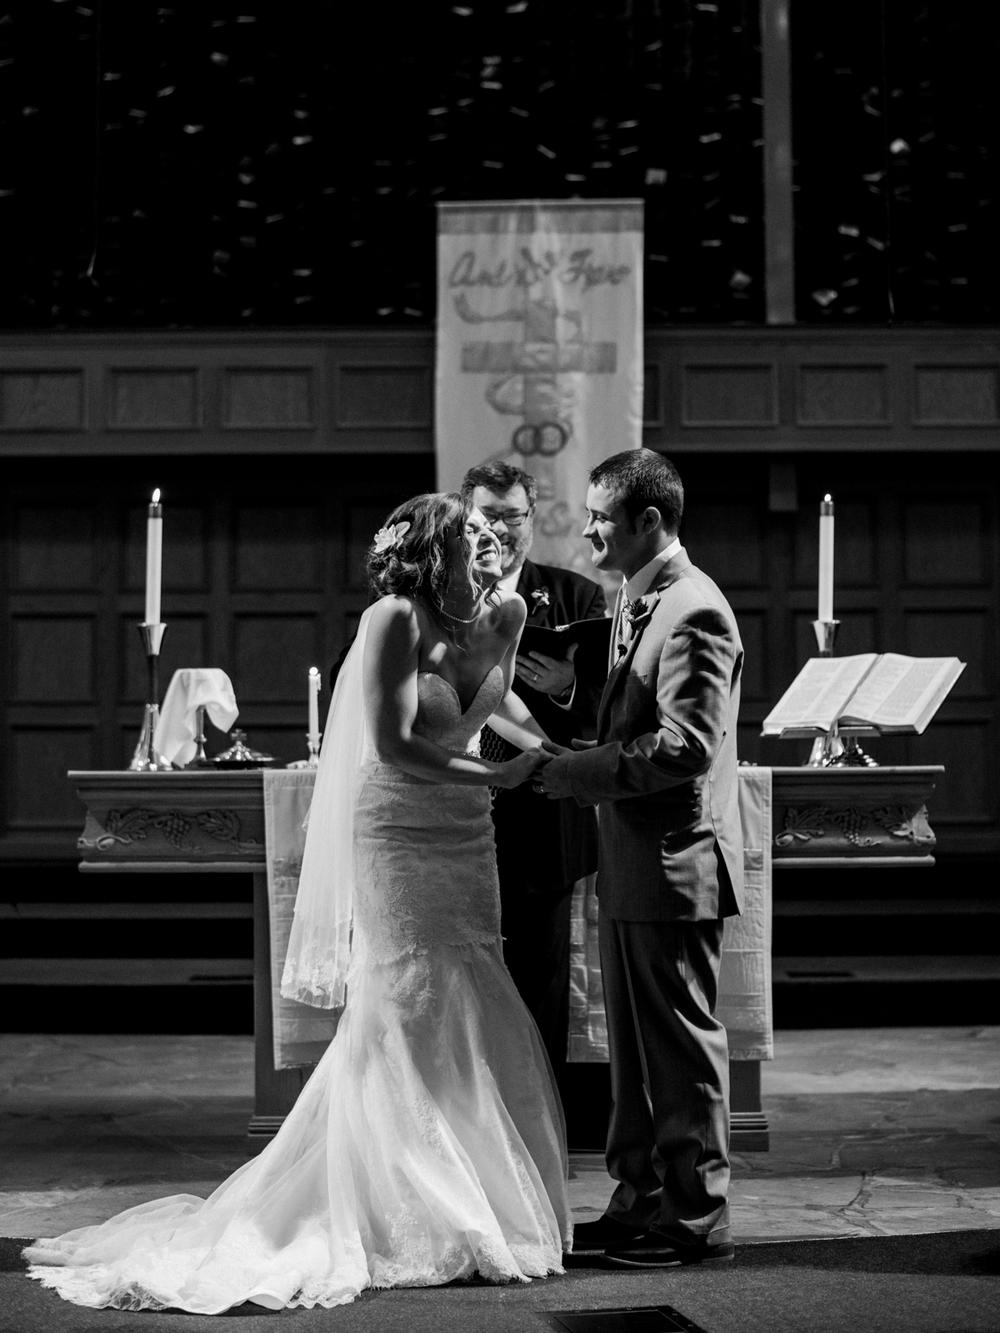 Dodge City, Kansas Wedding-Neal Dieker-Western Kansas Wedding Photographer-Dodge City, Kansas Wedding Photography-Wichita, Kansas Wedding Photographer-257.jpg